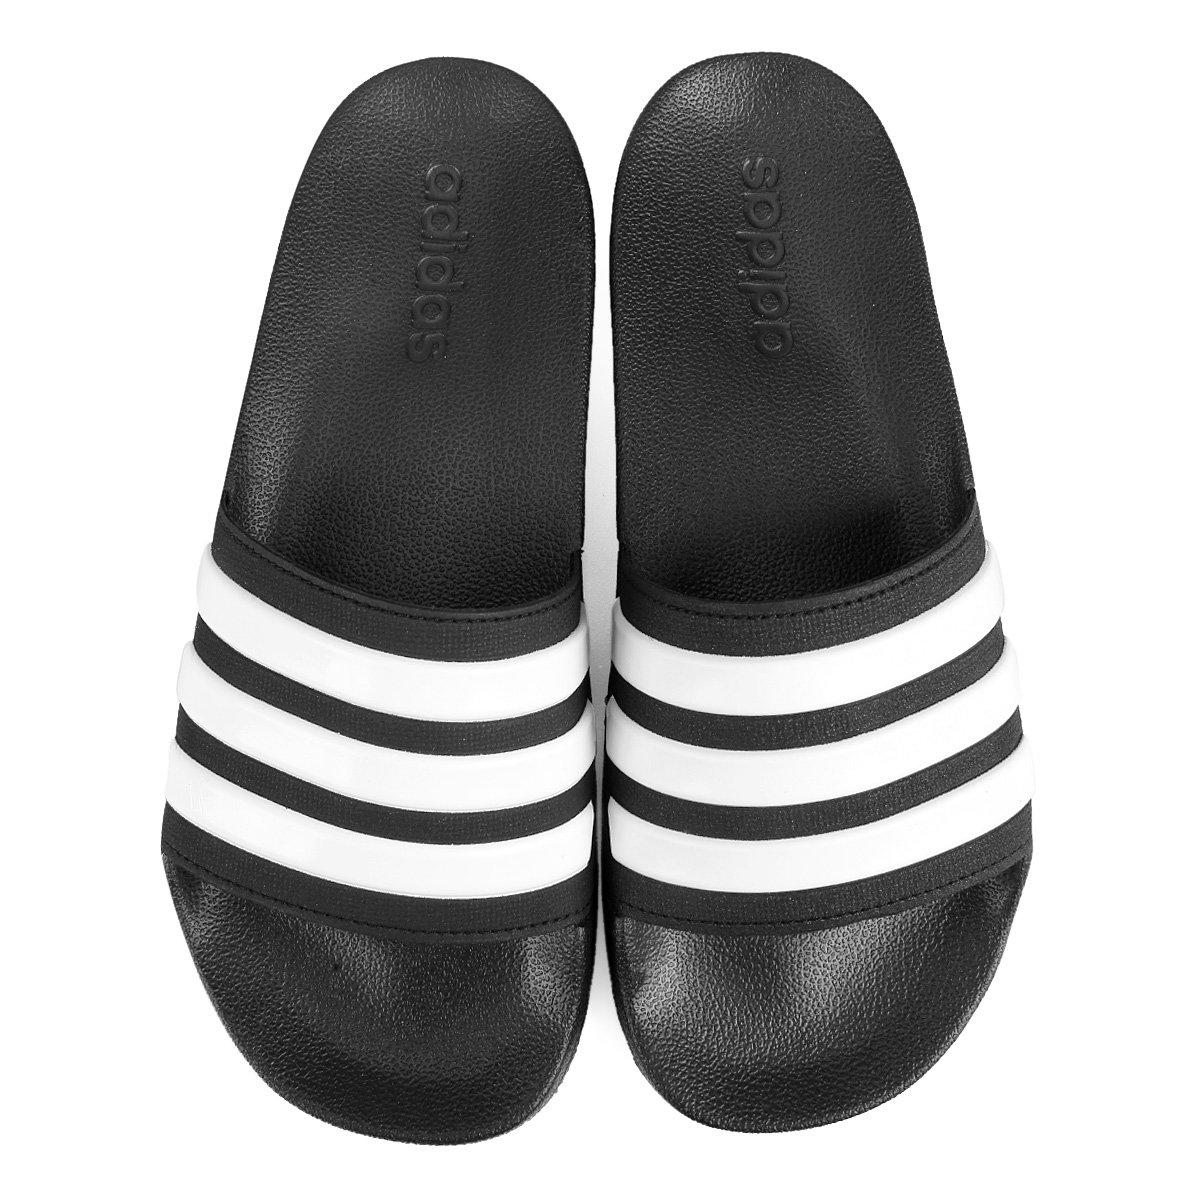 Chinelo Slide Adidas Adilette Cloudfoam Masculino - Preto e Branco ... ed365114acc77